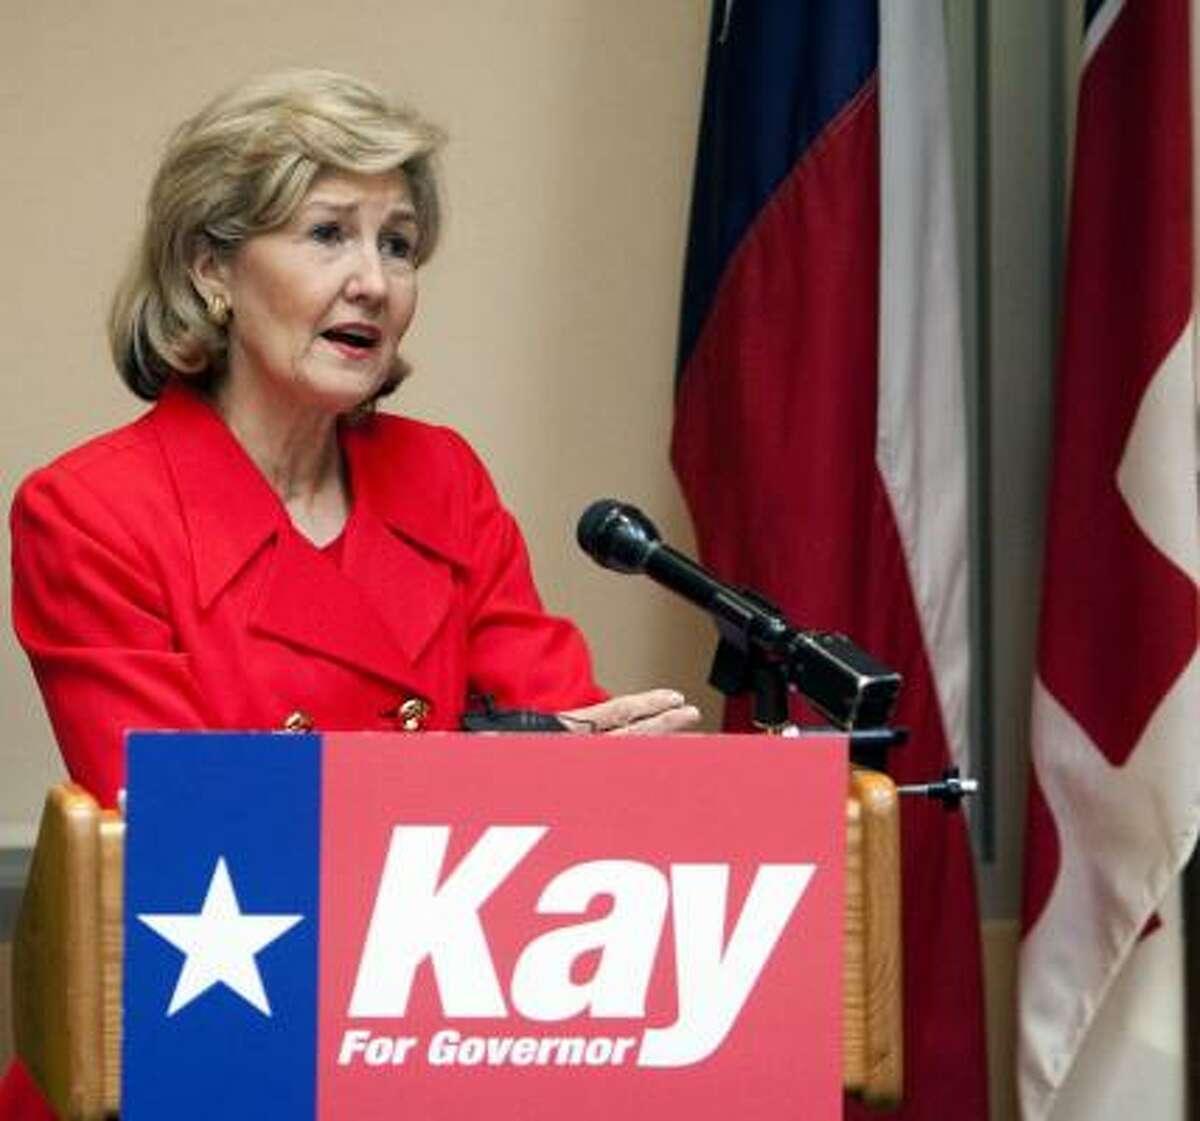 Sen. Kay Bailey Hutchison, R-Texas, addresses the Greater Houston Pachyderm Club Tuesday Jan. 19, 2010, in Houston.